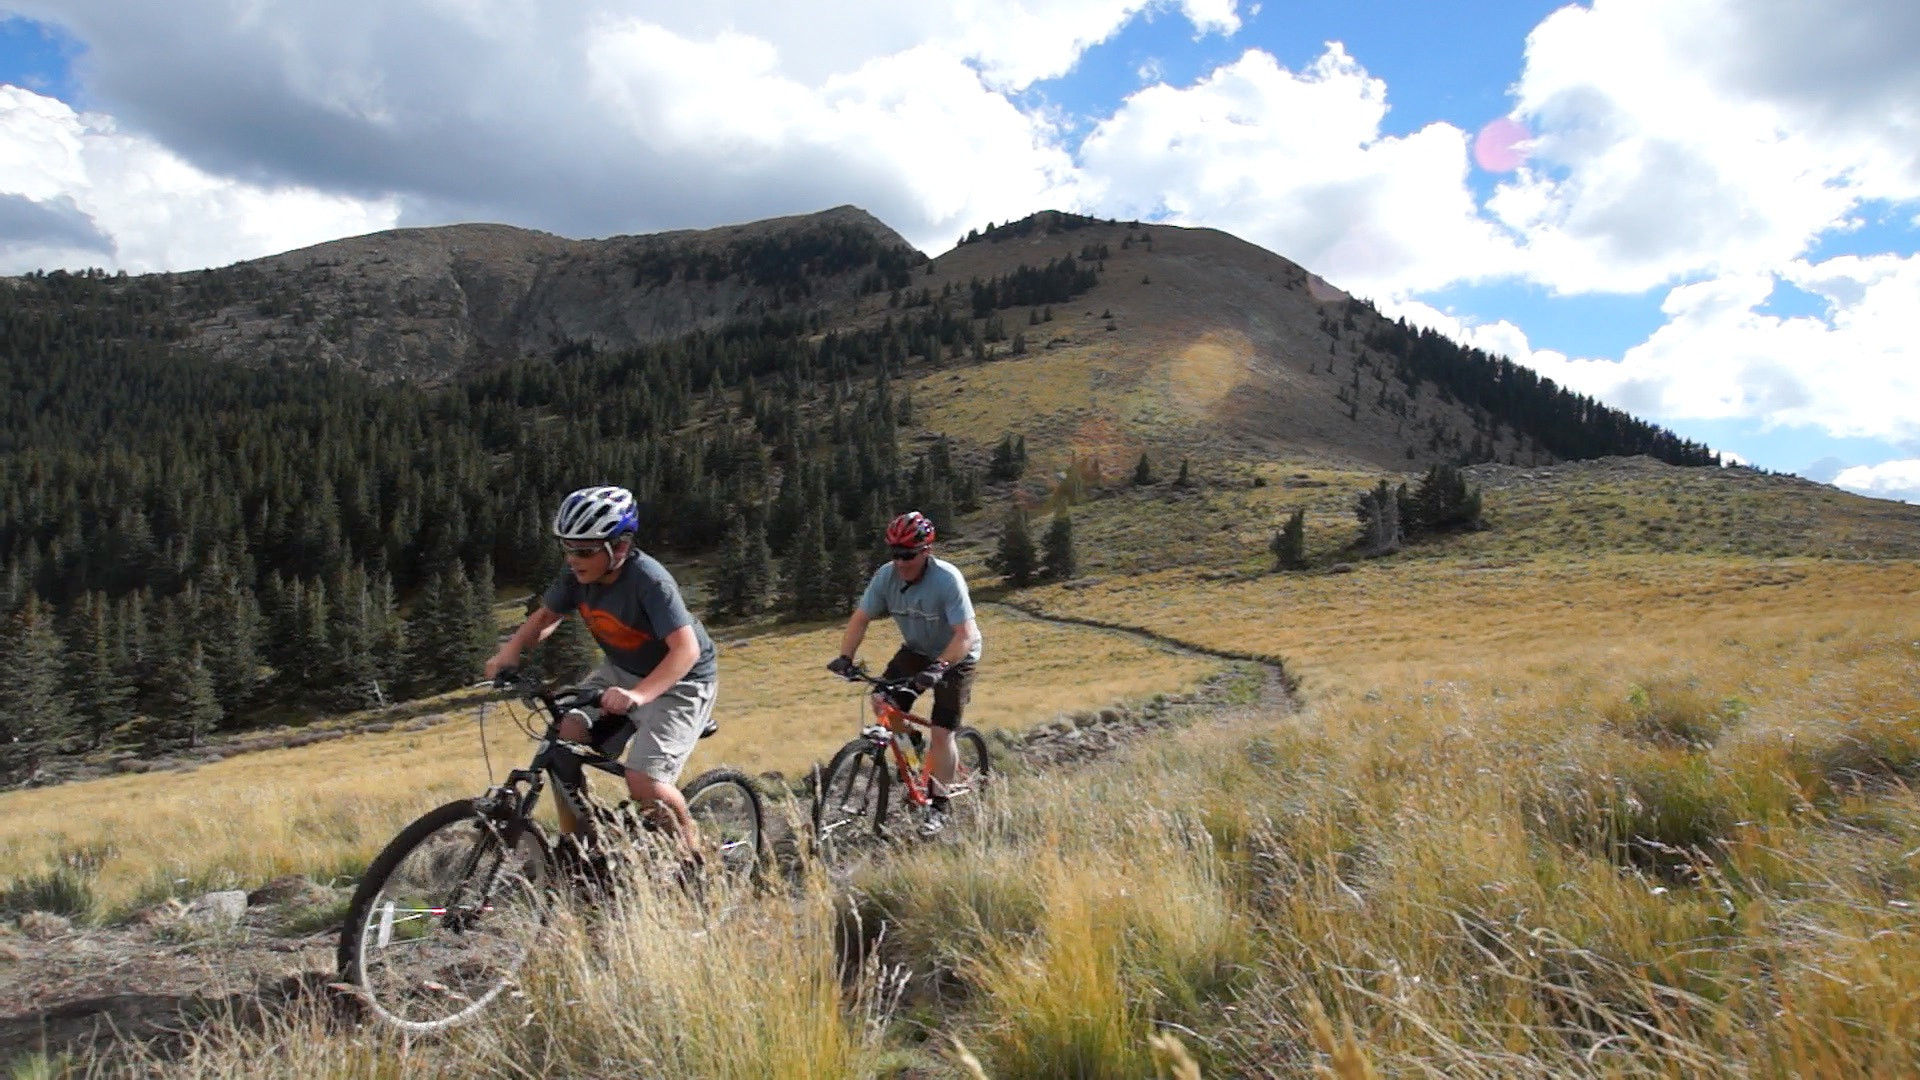 Biking Sierra Blanca